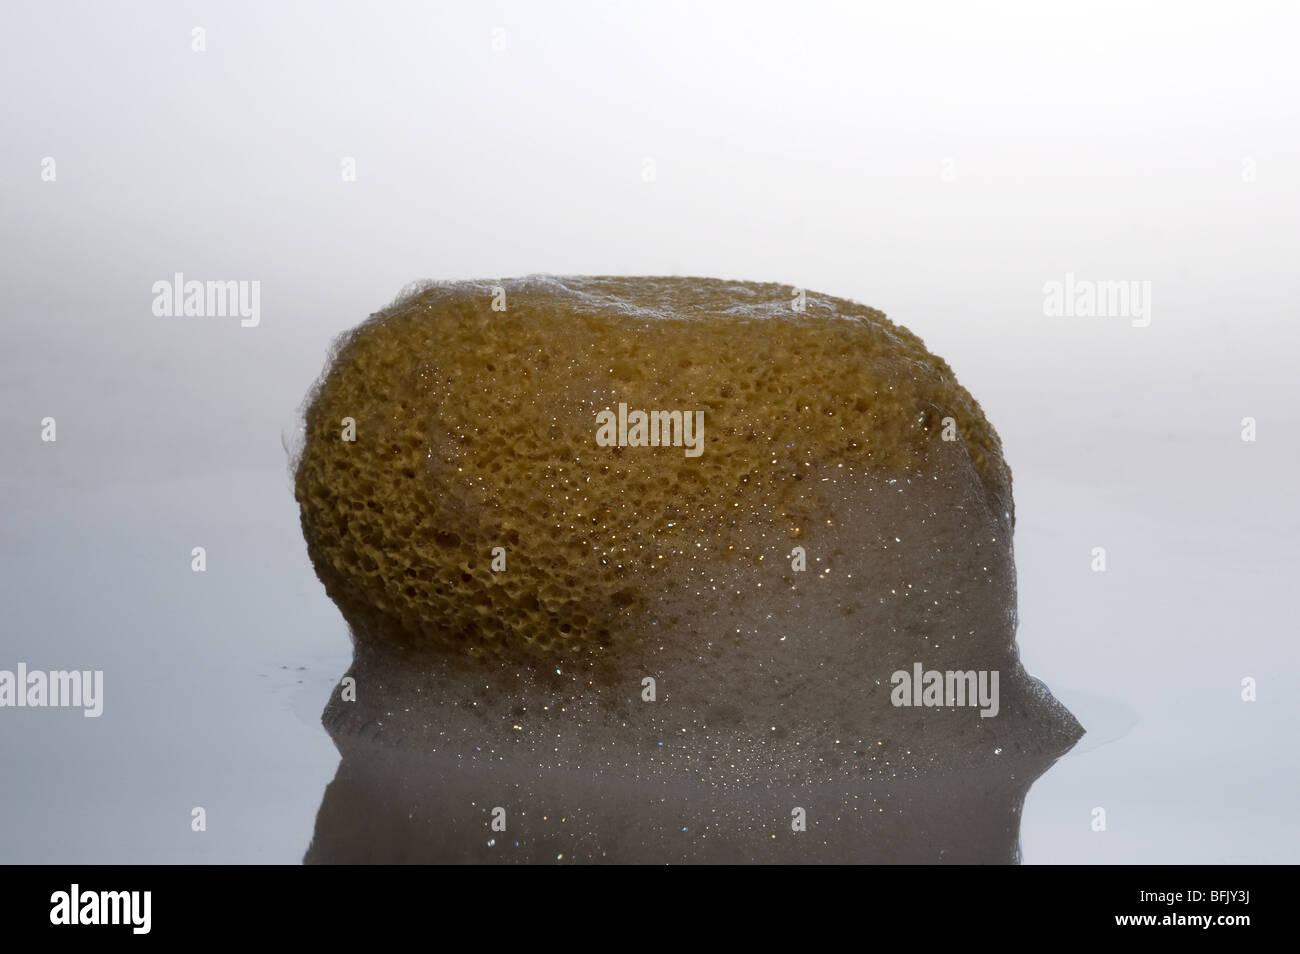 A lathery bath sponge. - Stock Image